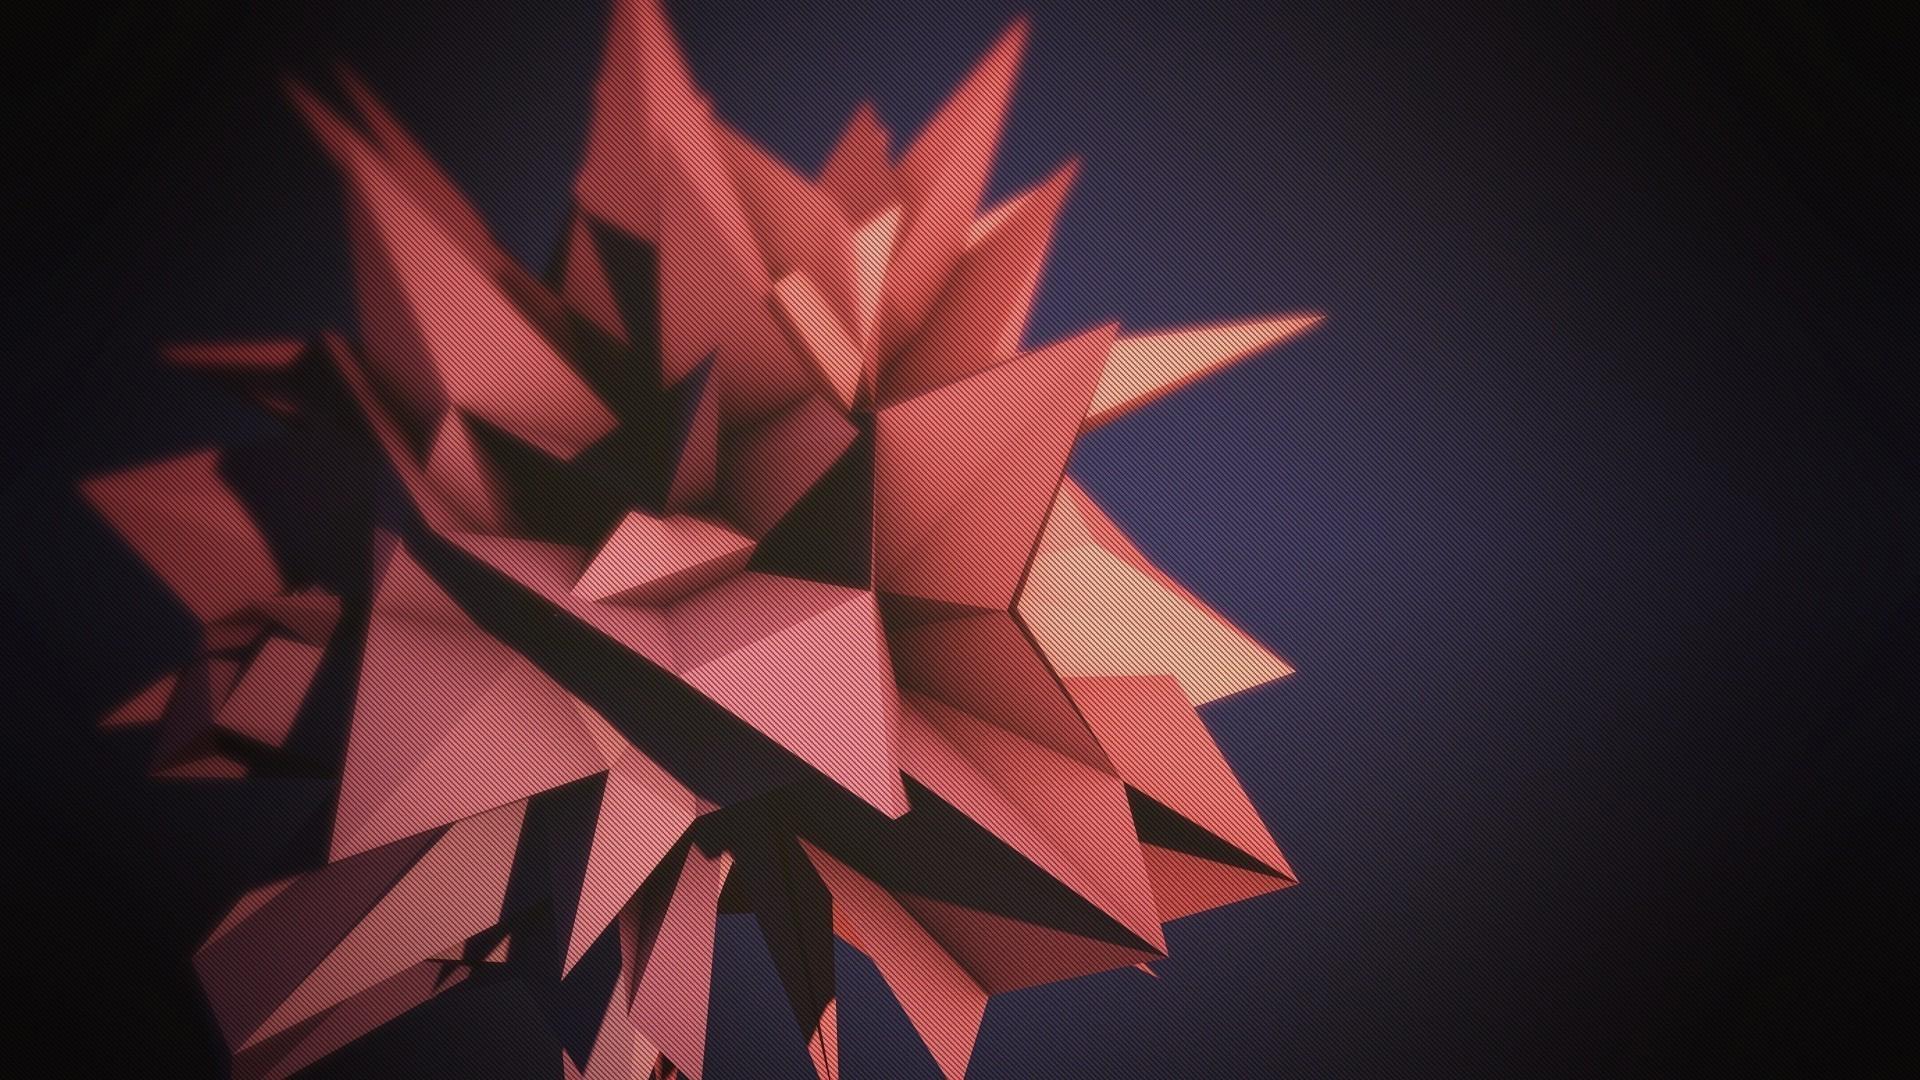 Polygon starry shape HD wallpaper   3D Desktop Wallpaper